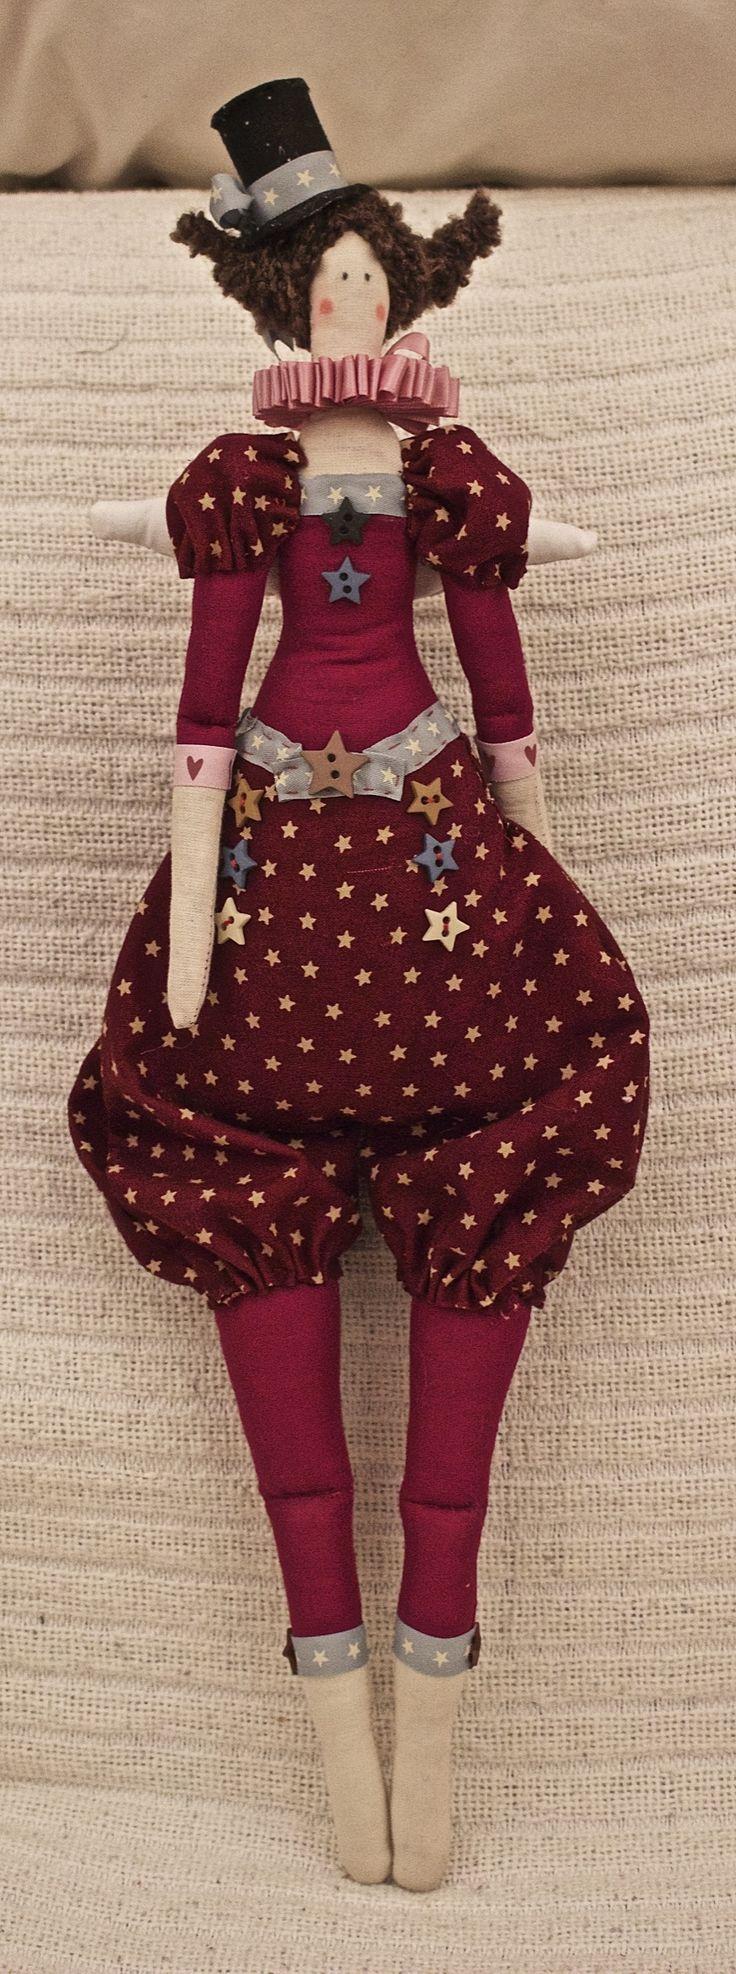 #tilda #sewing#cucito#creativo #hat#pants#fashion#love#dolls#norway#italy #handmade #hobby#home#craft